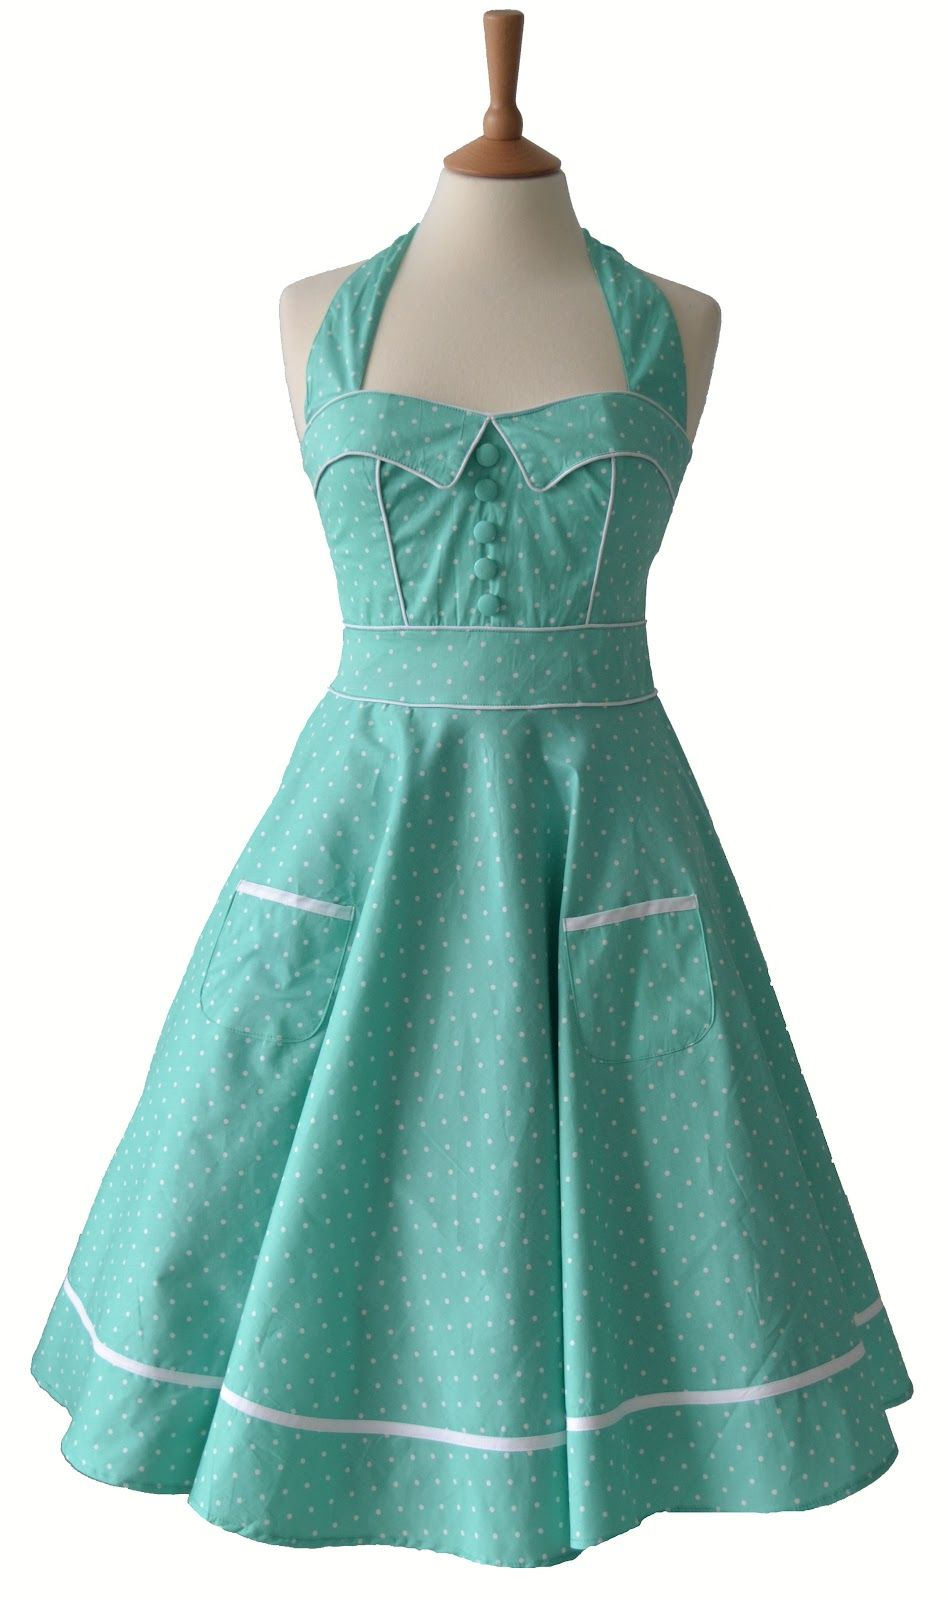 Cute 1950s style dresses